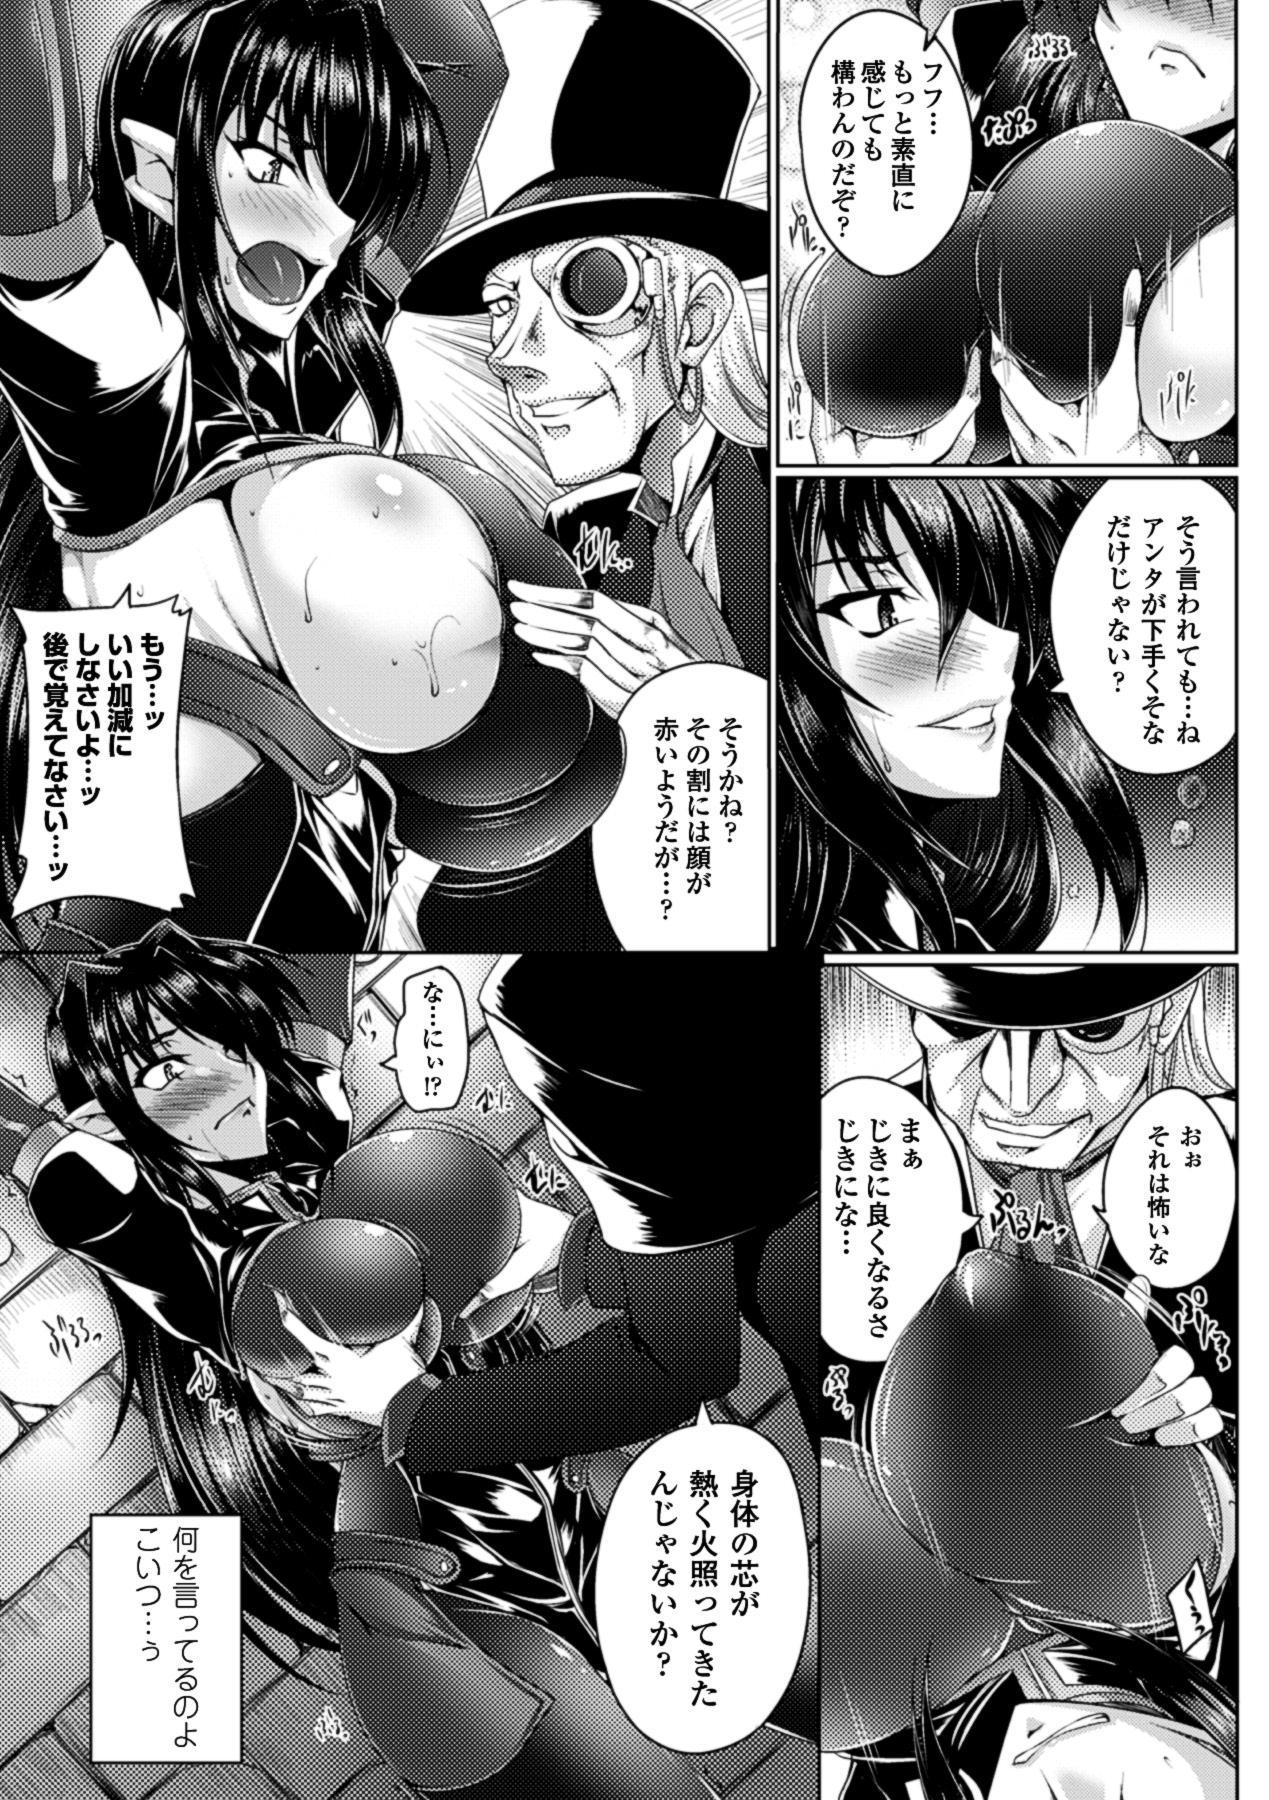 Megami Crisis 10 12